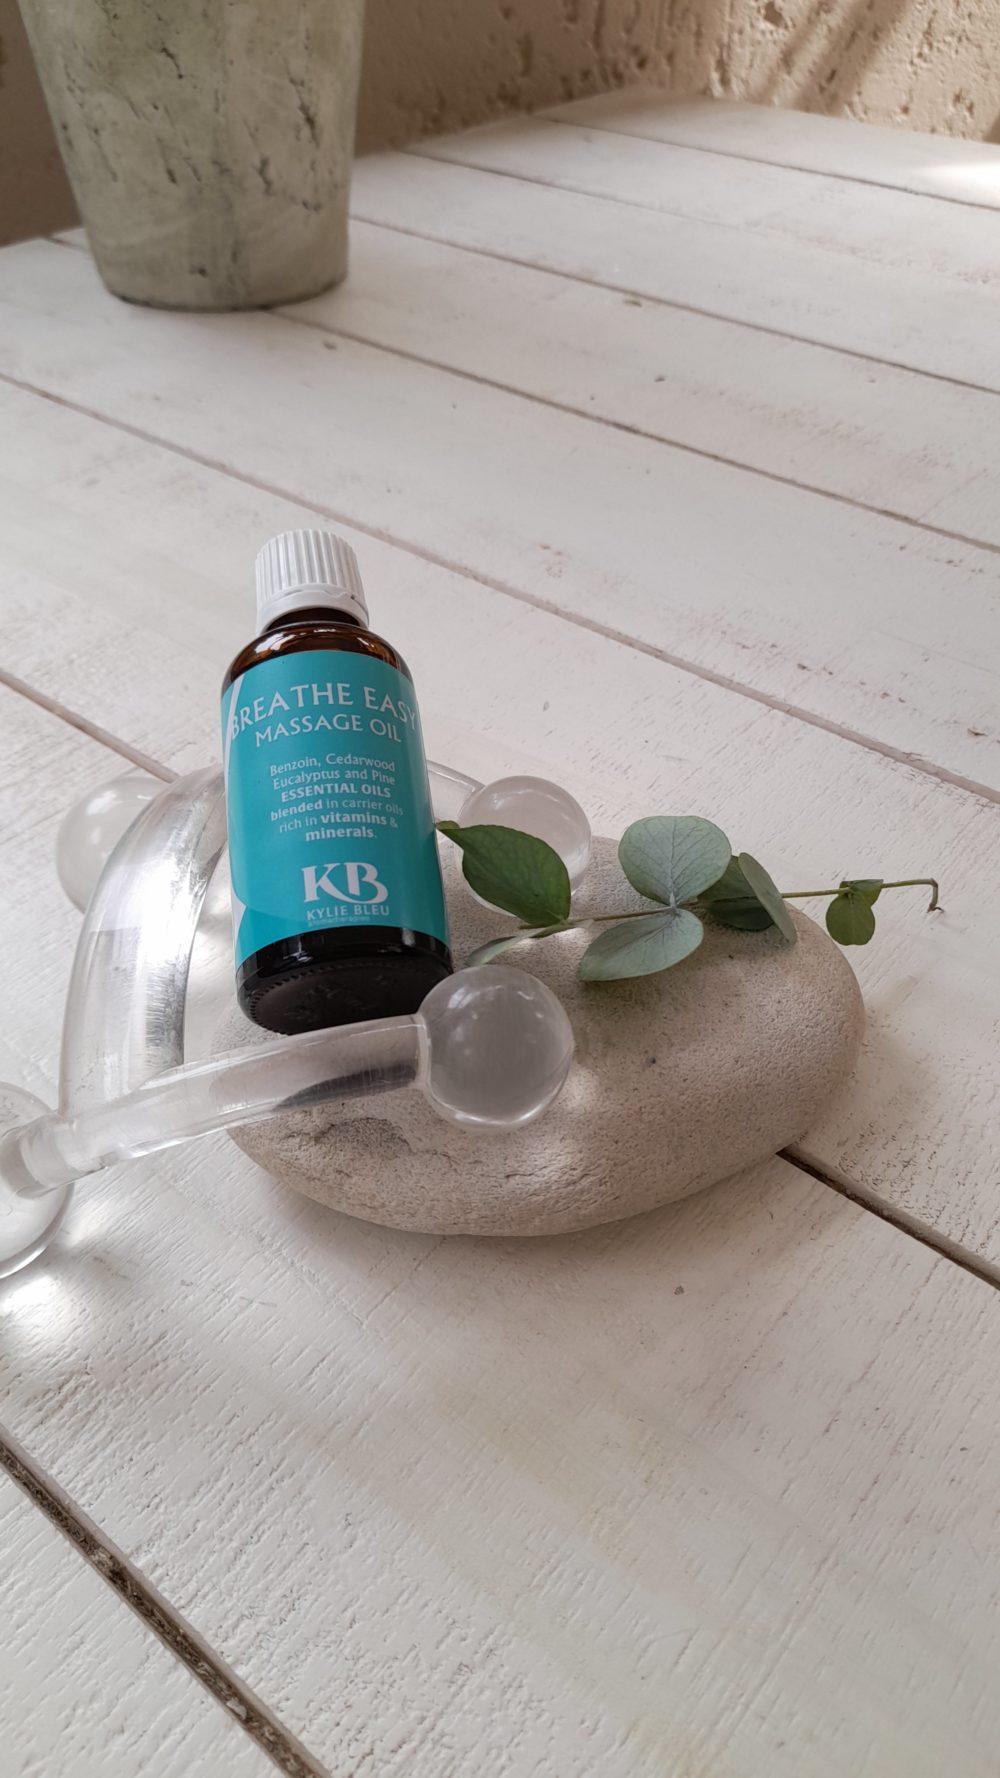 Breathe Easy Massage Oil - Eucalyptus, Benzoin, Cedarwood, Pine, blend